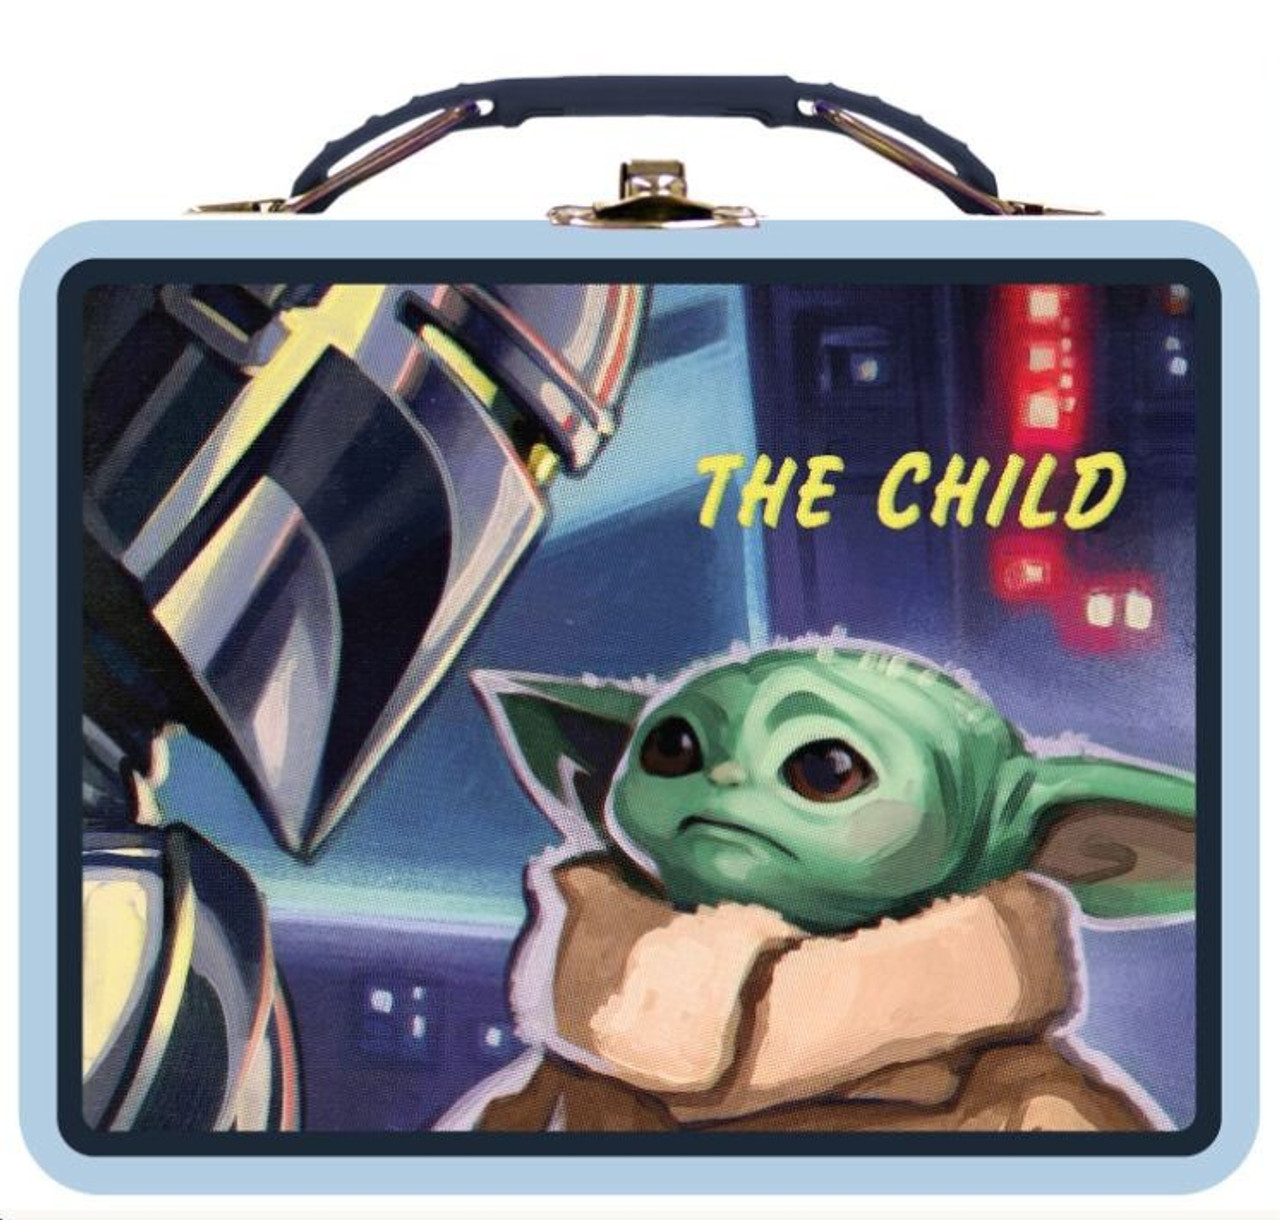 Star Wars Mandalorian The Child Baby Yoda in Pram Levitate Bag Backpack Clip